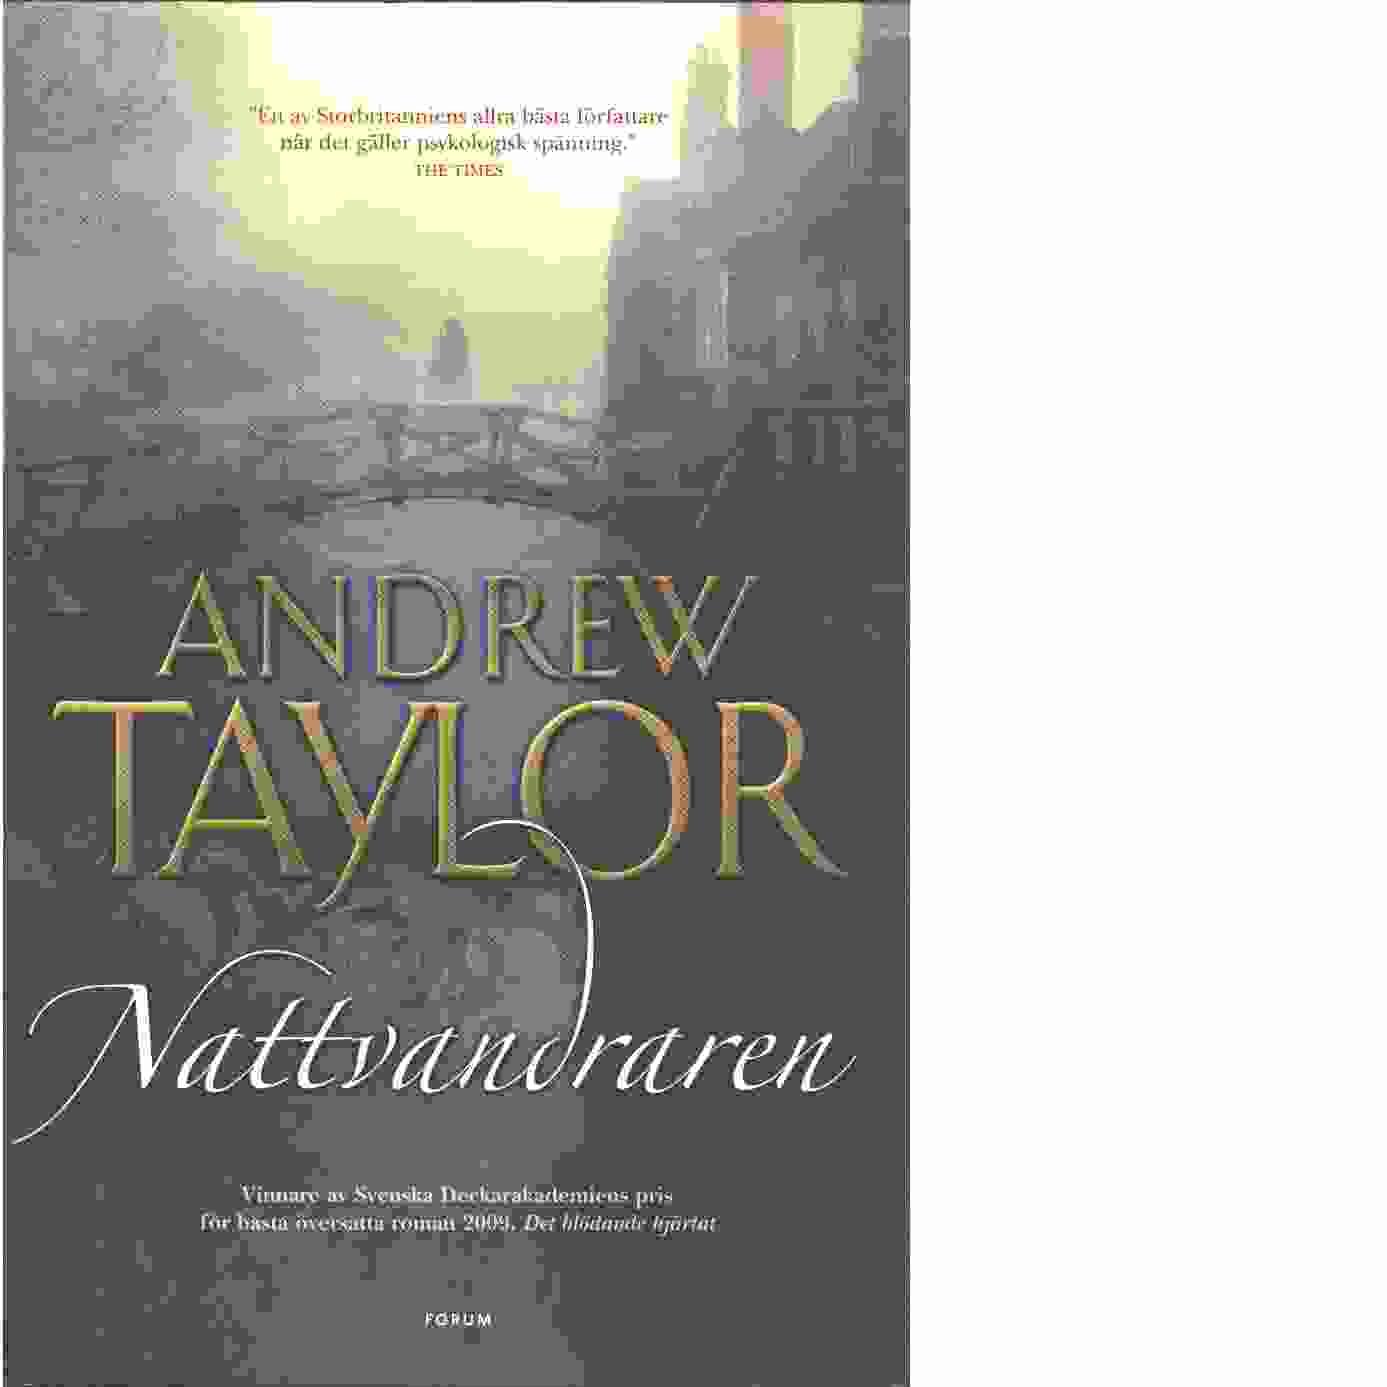 Nattvandraren - Taylor, Andrew